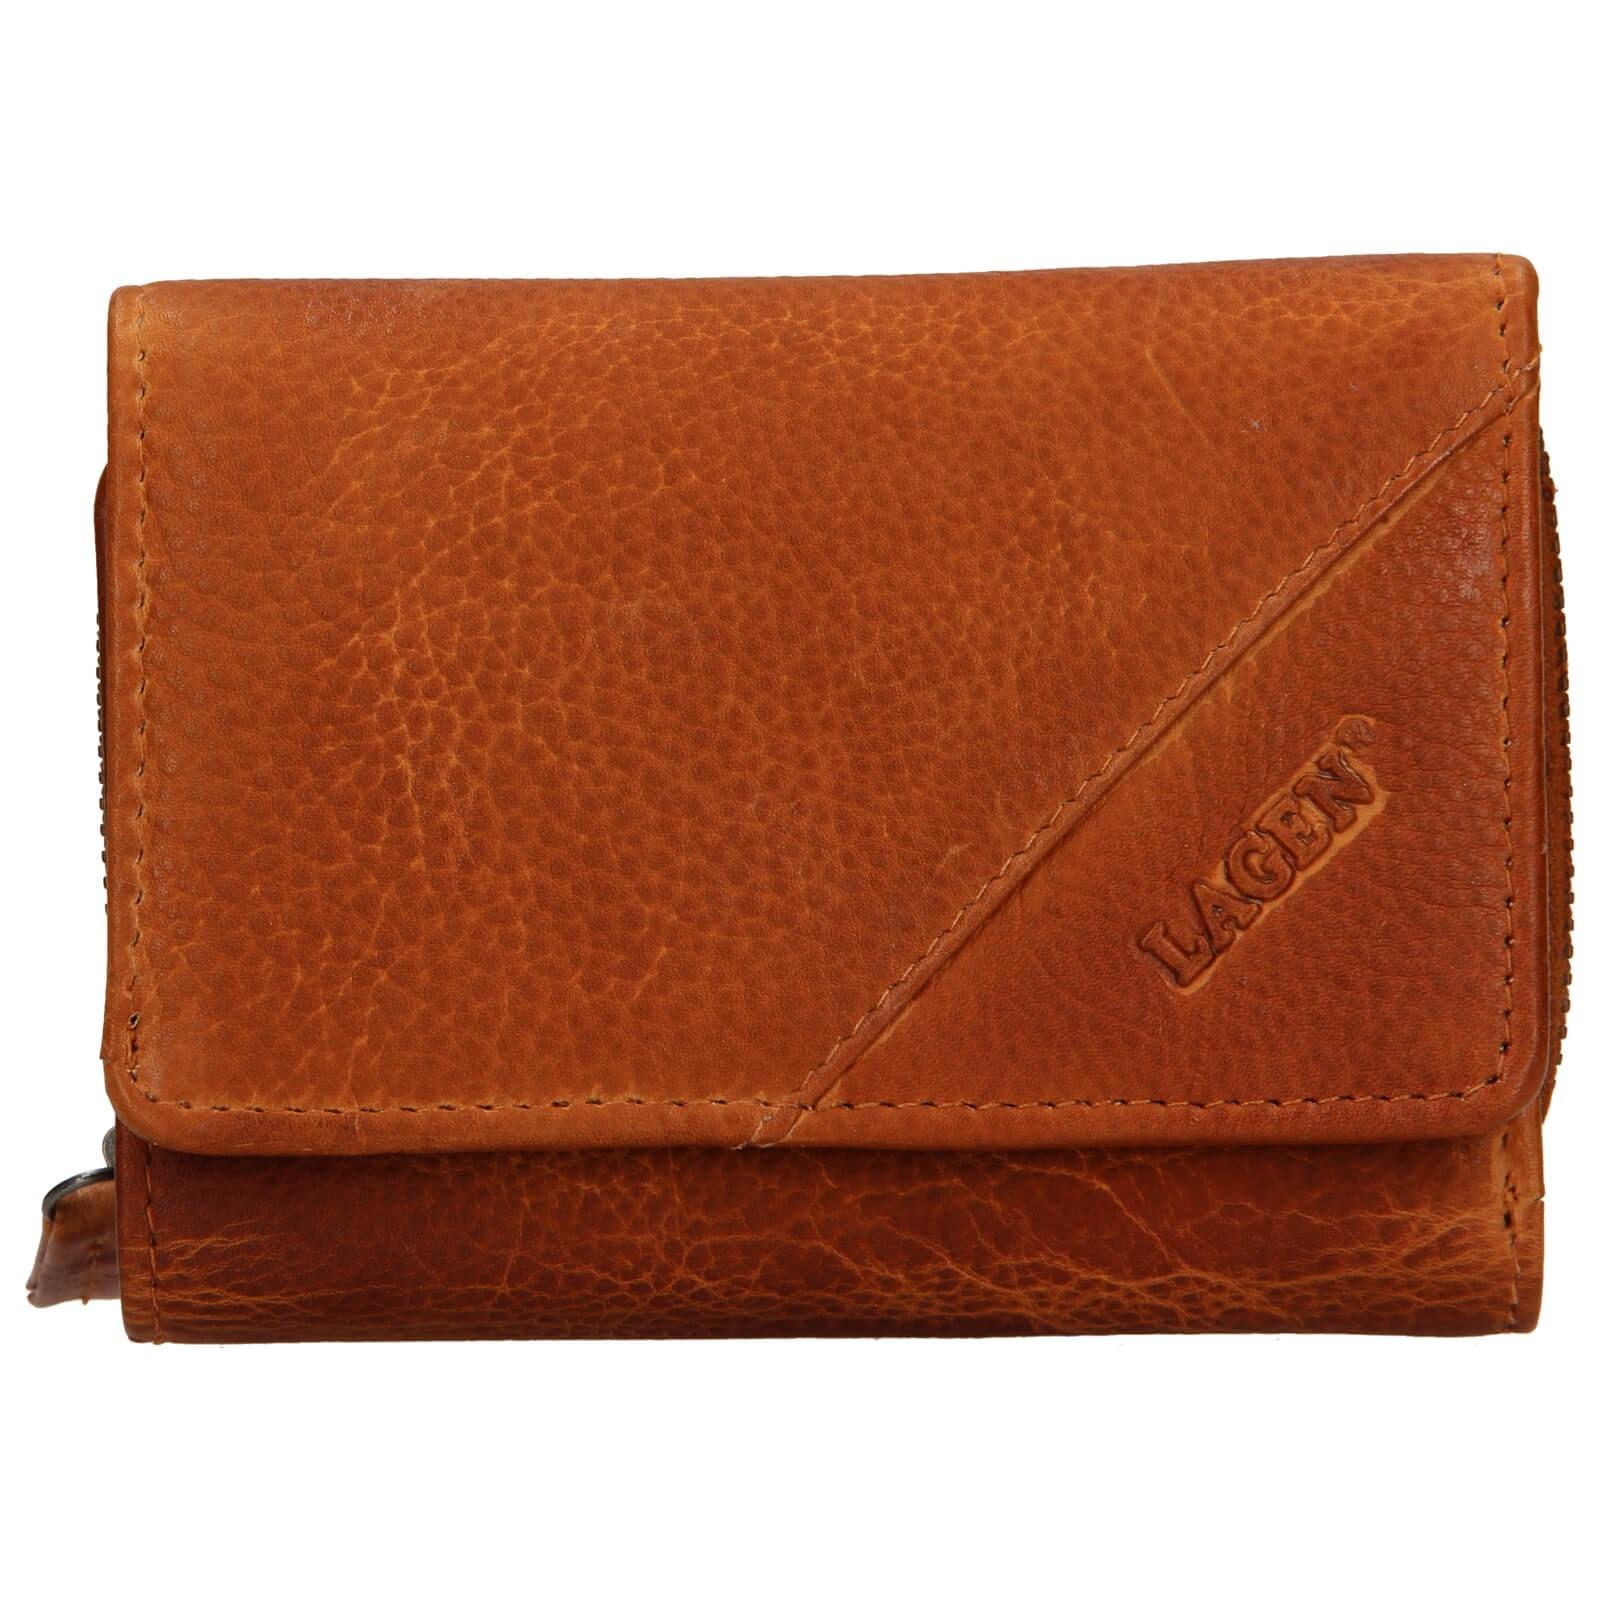 Dámska kožená peňaženka Lagen Norra - hnedá